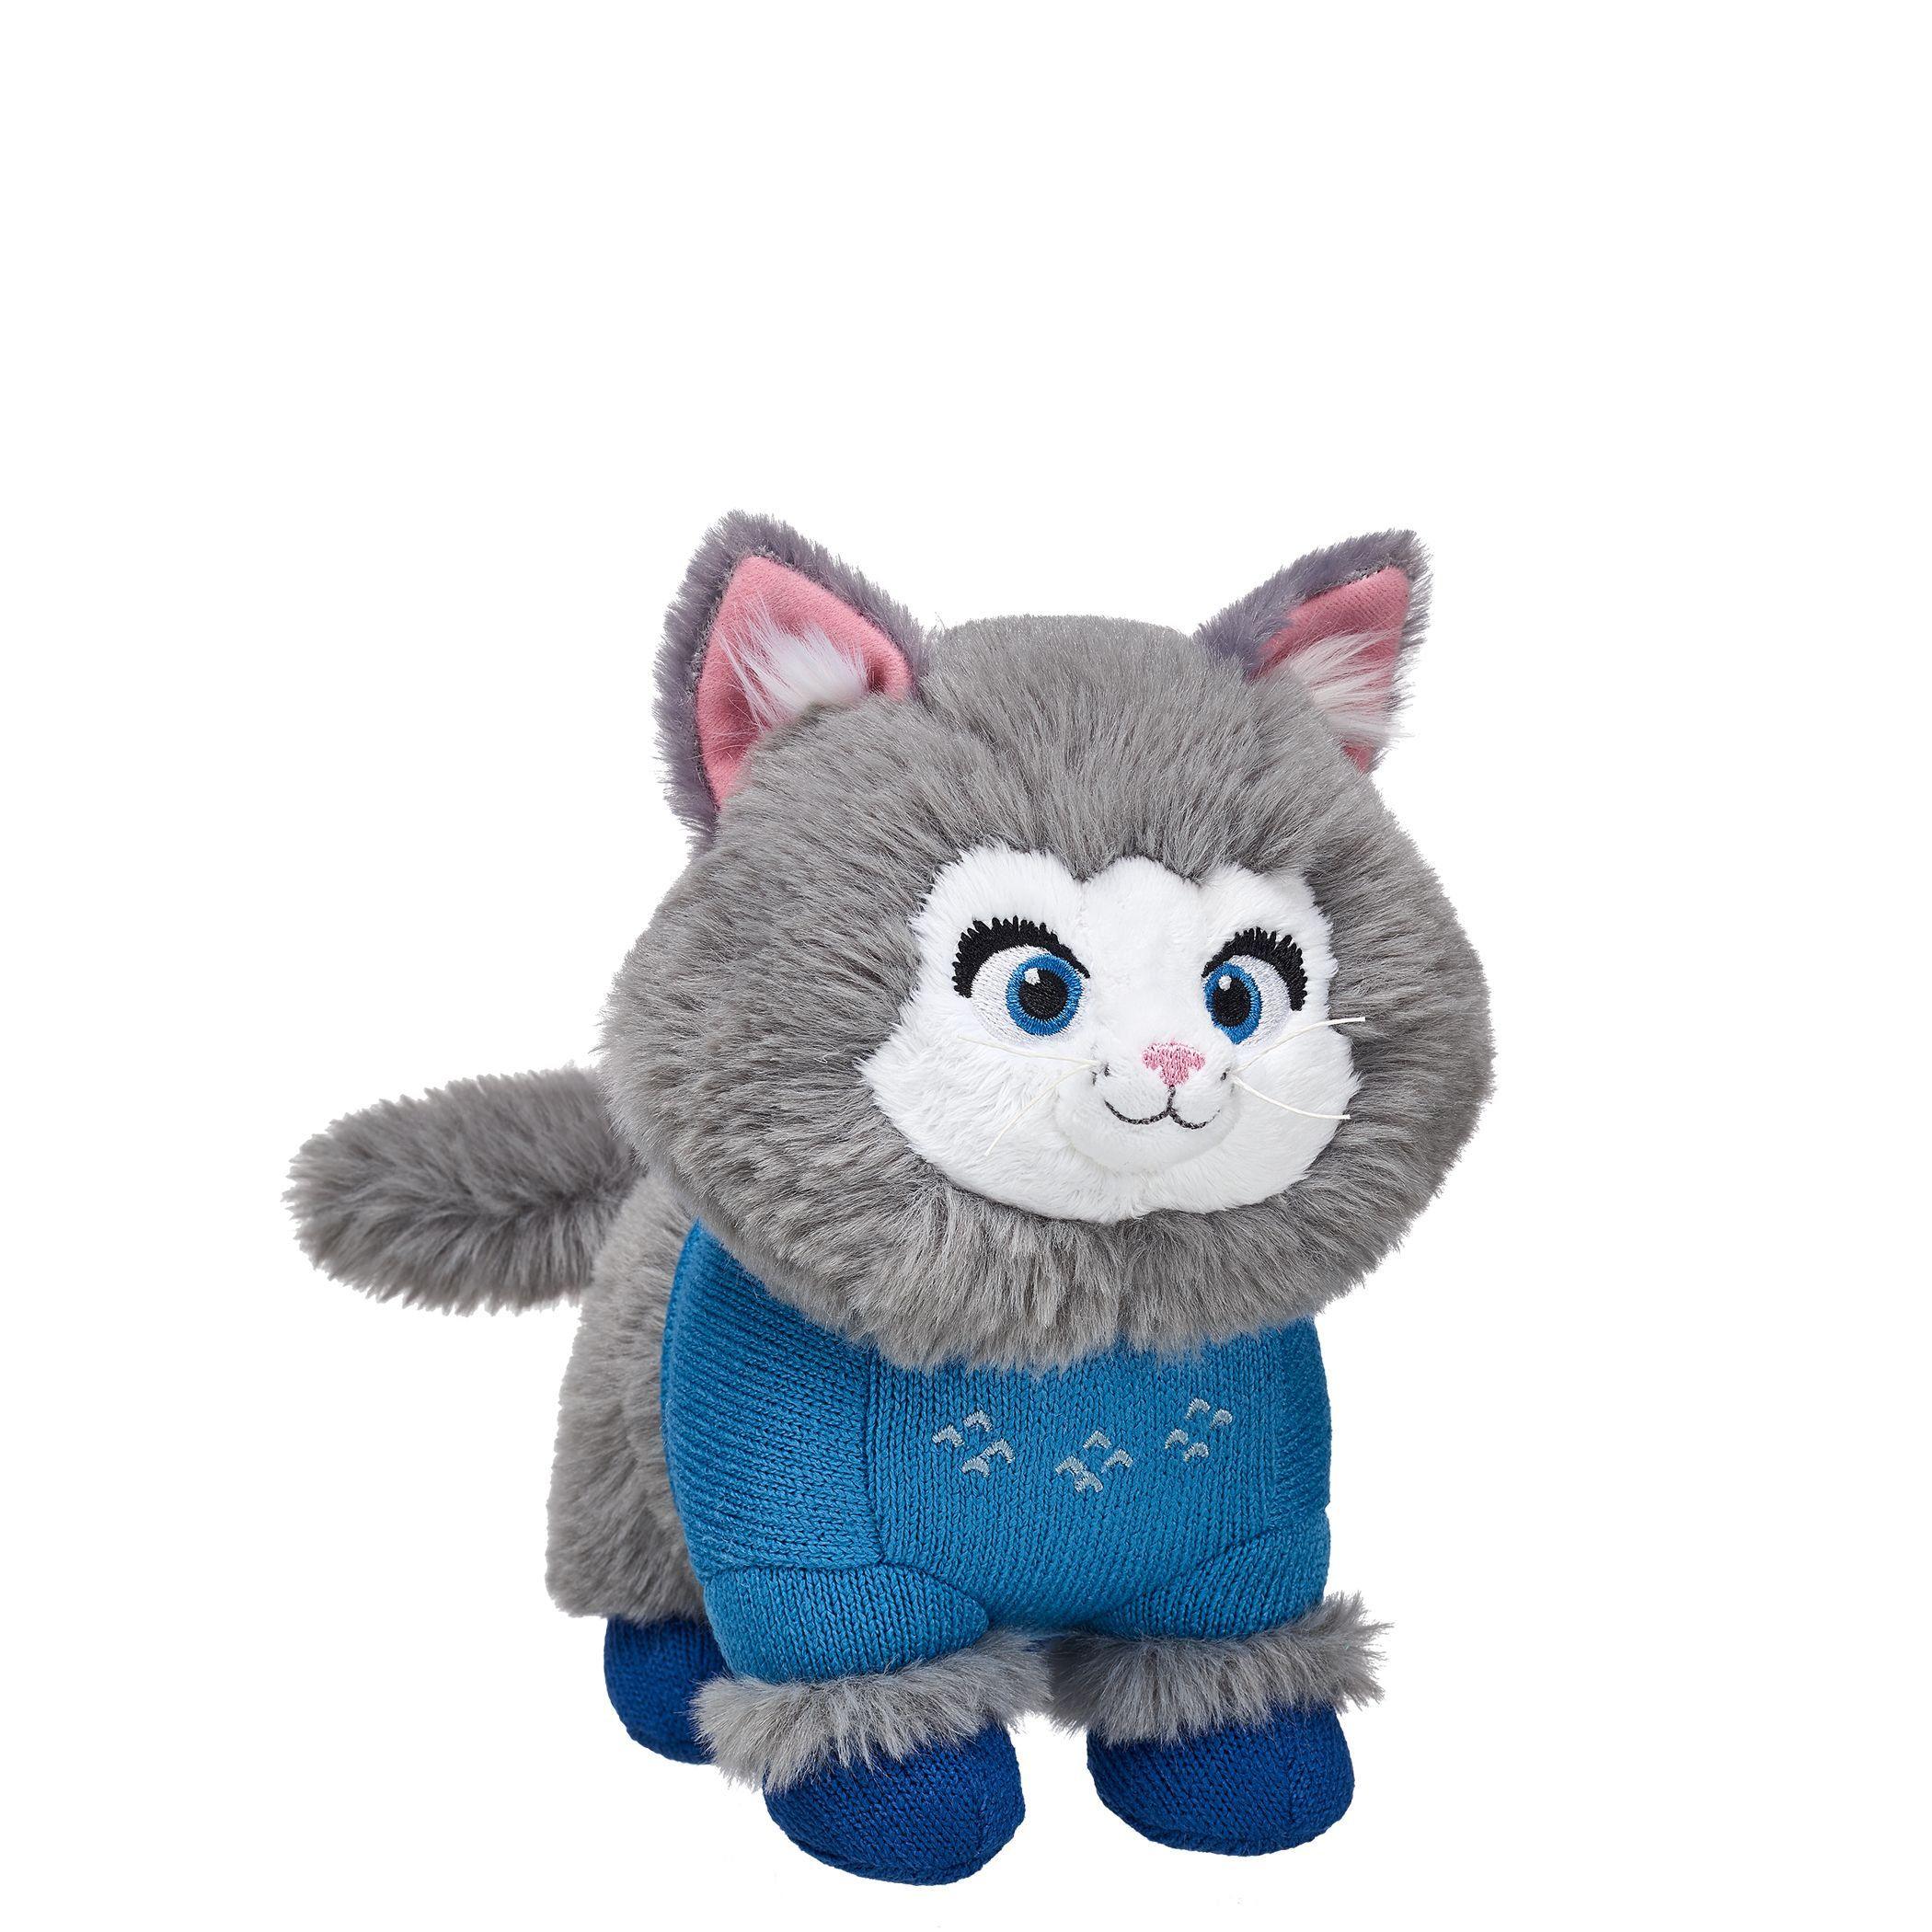 Disney S Olaf S Frozen Adventure Kitten Disney Olaf Kitten Disney Plush